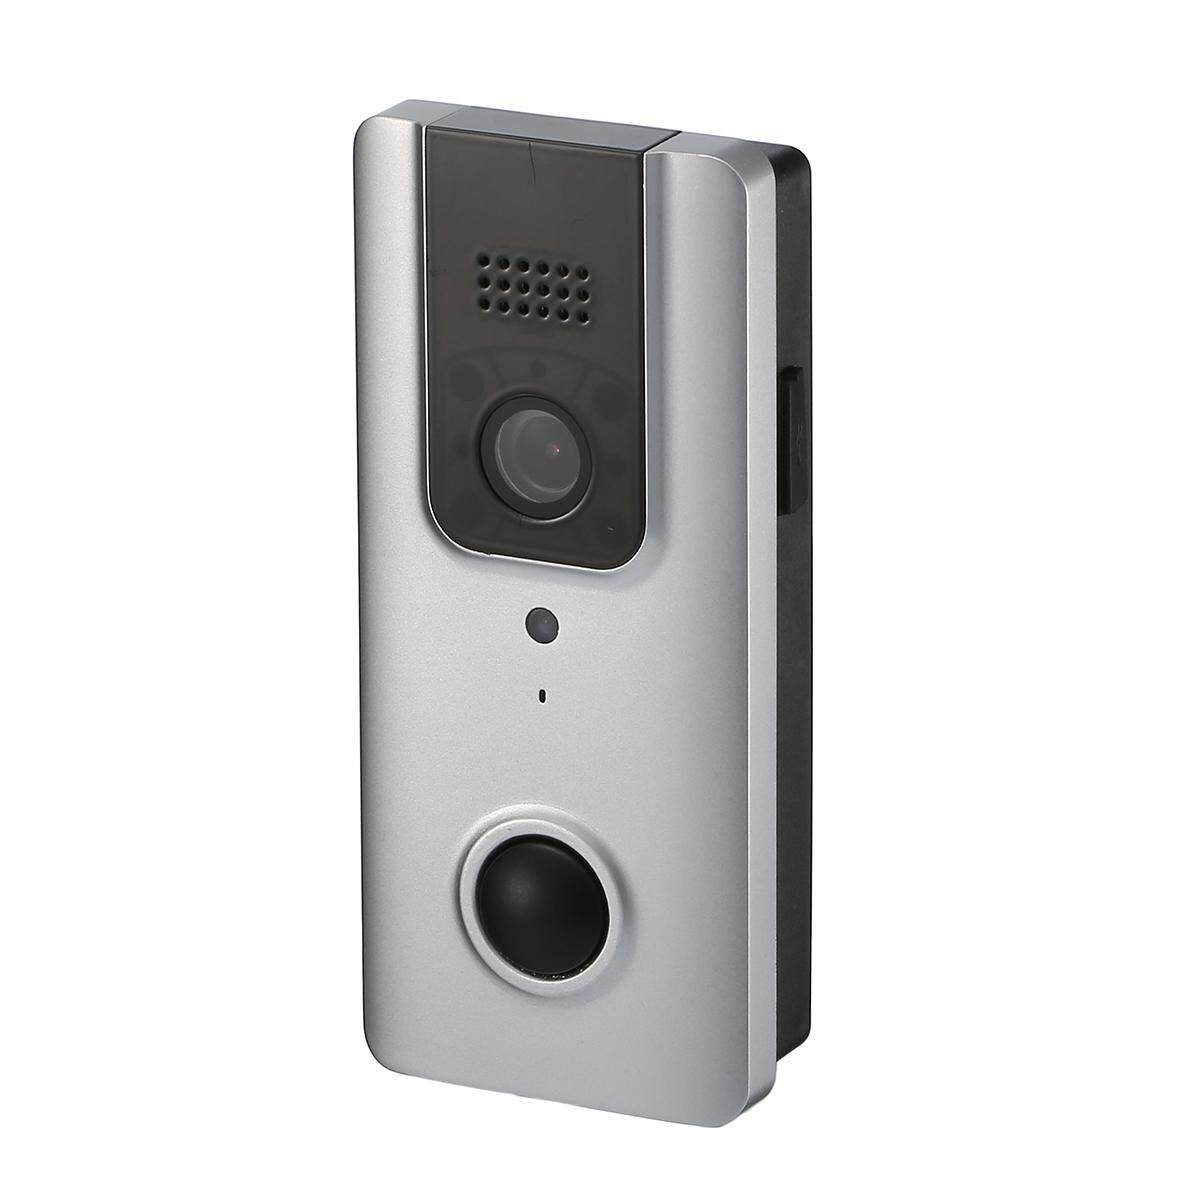 Digoo SB-XYA New Upgrade Wireless Full HD 1080P bluetooth and WIFI Video  Doorbell Pro Smart Home PIR Sensor Rechargeable Doorbell Camera Phone Ring